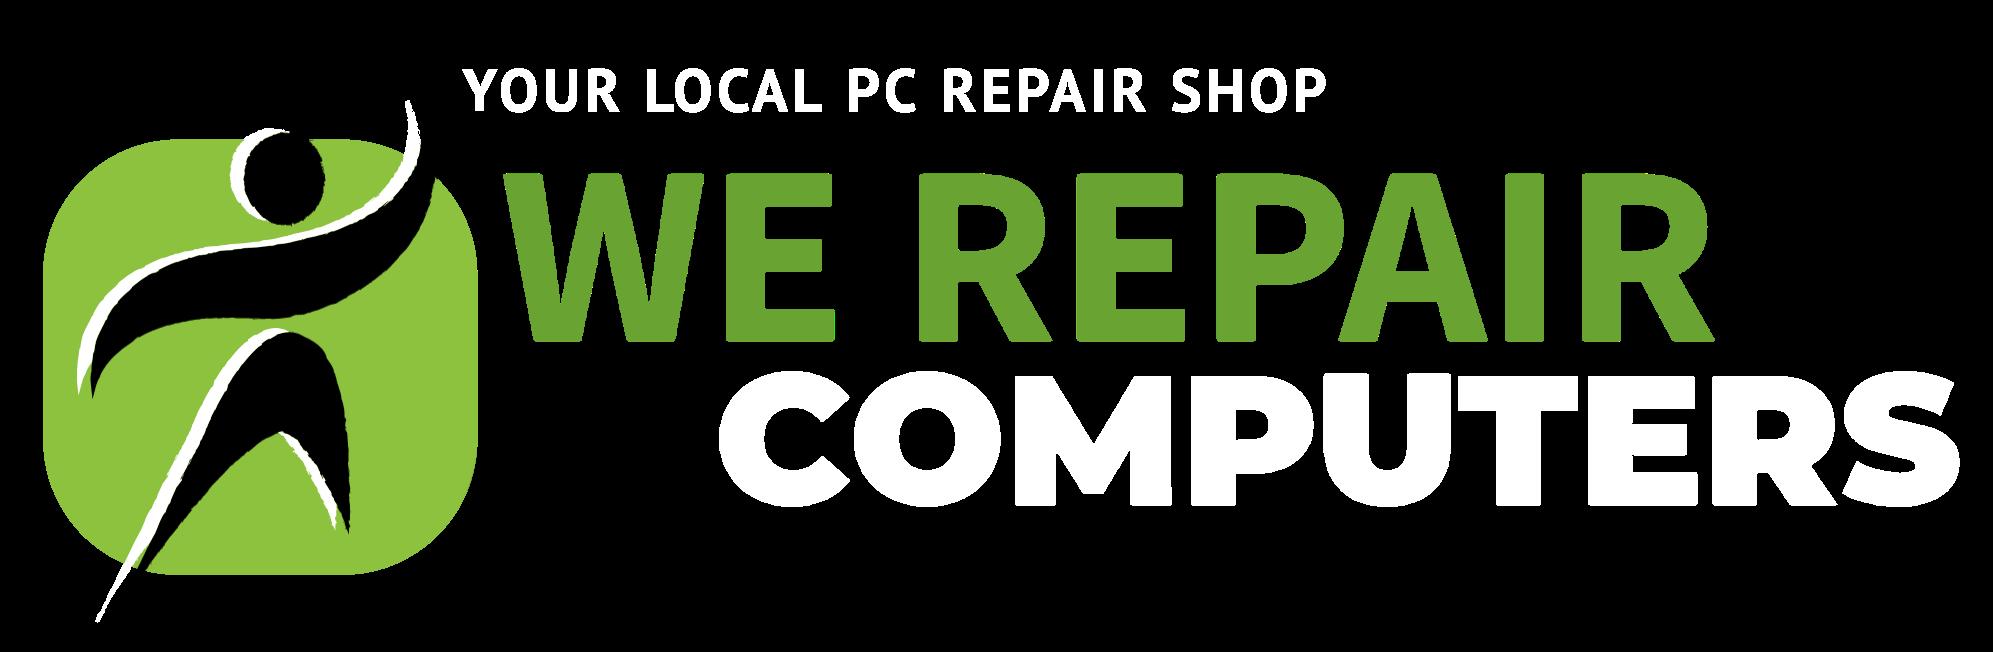 We Repair Computers